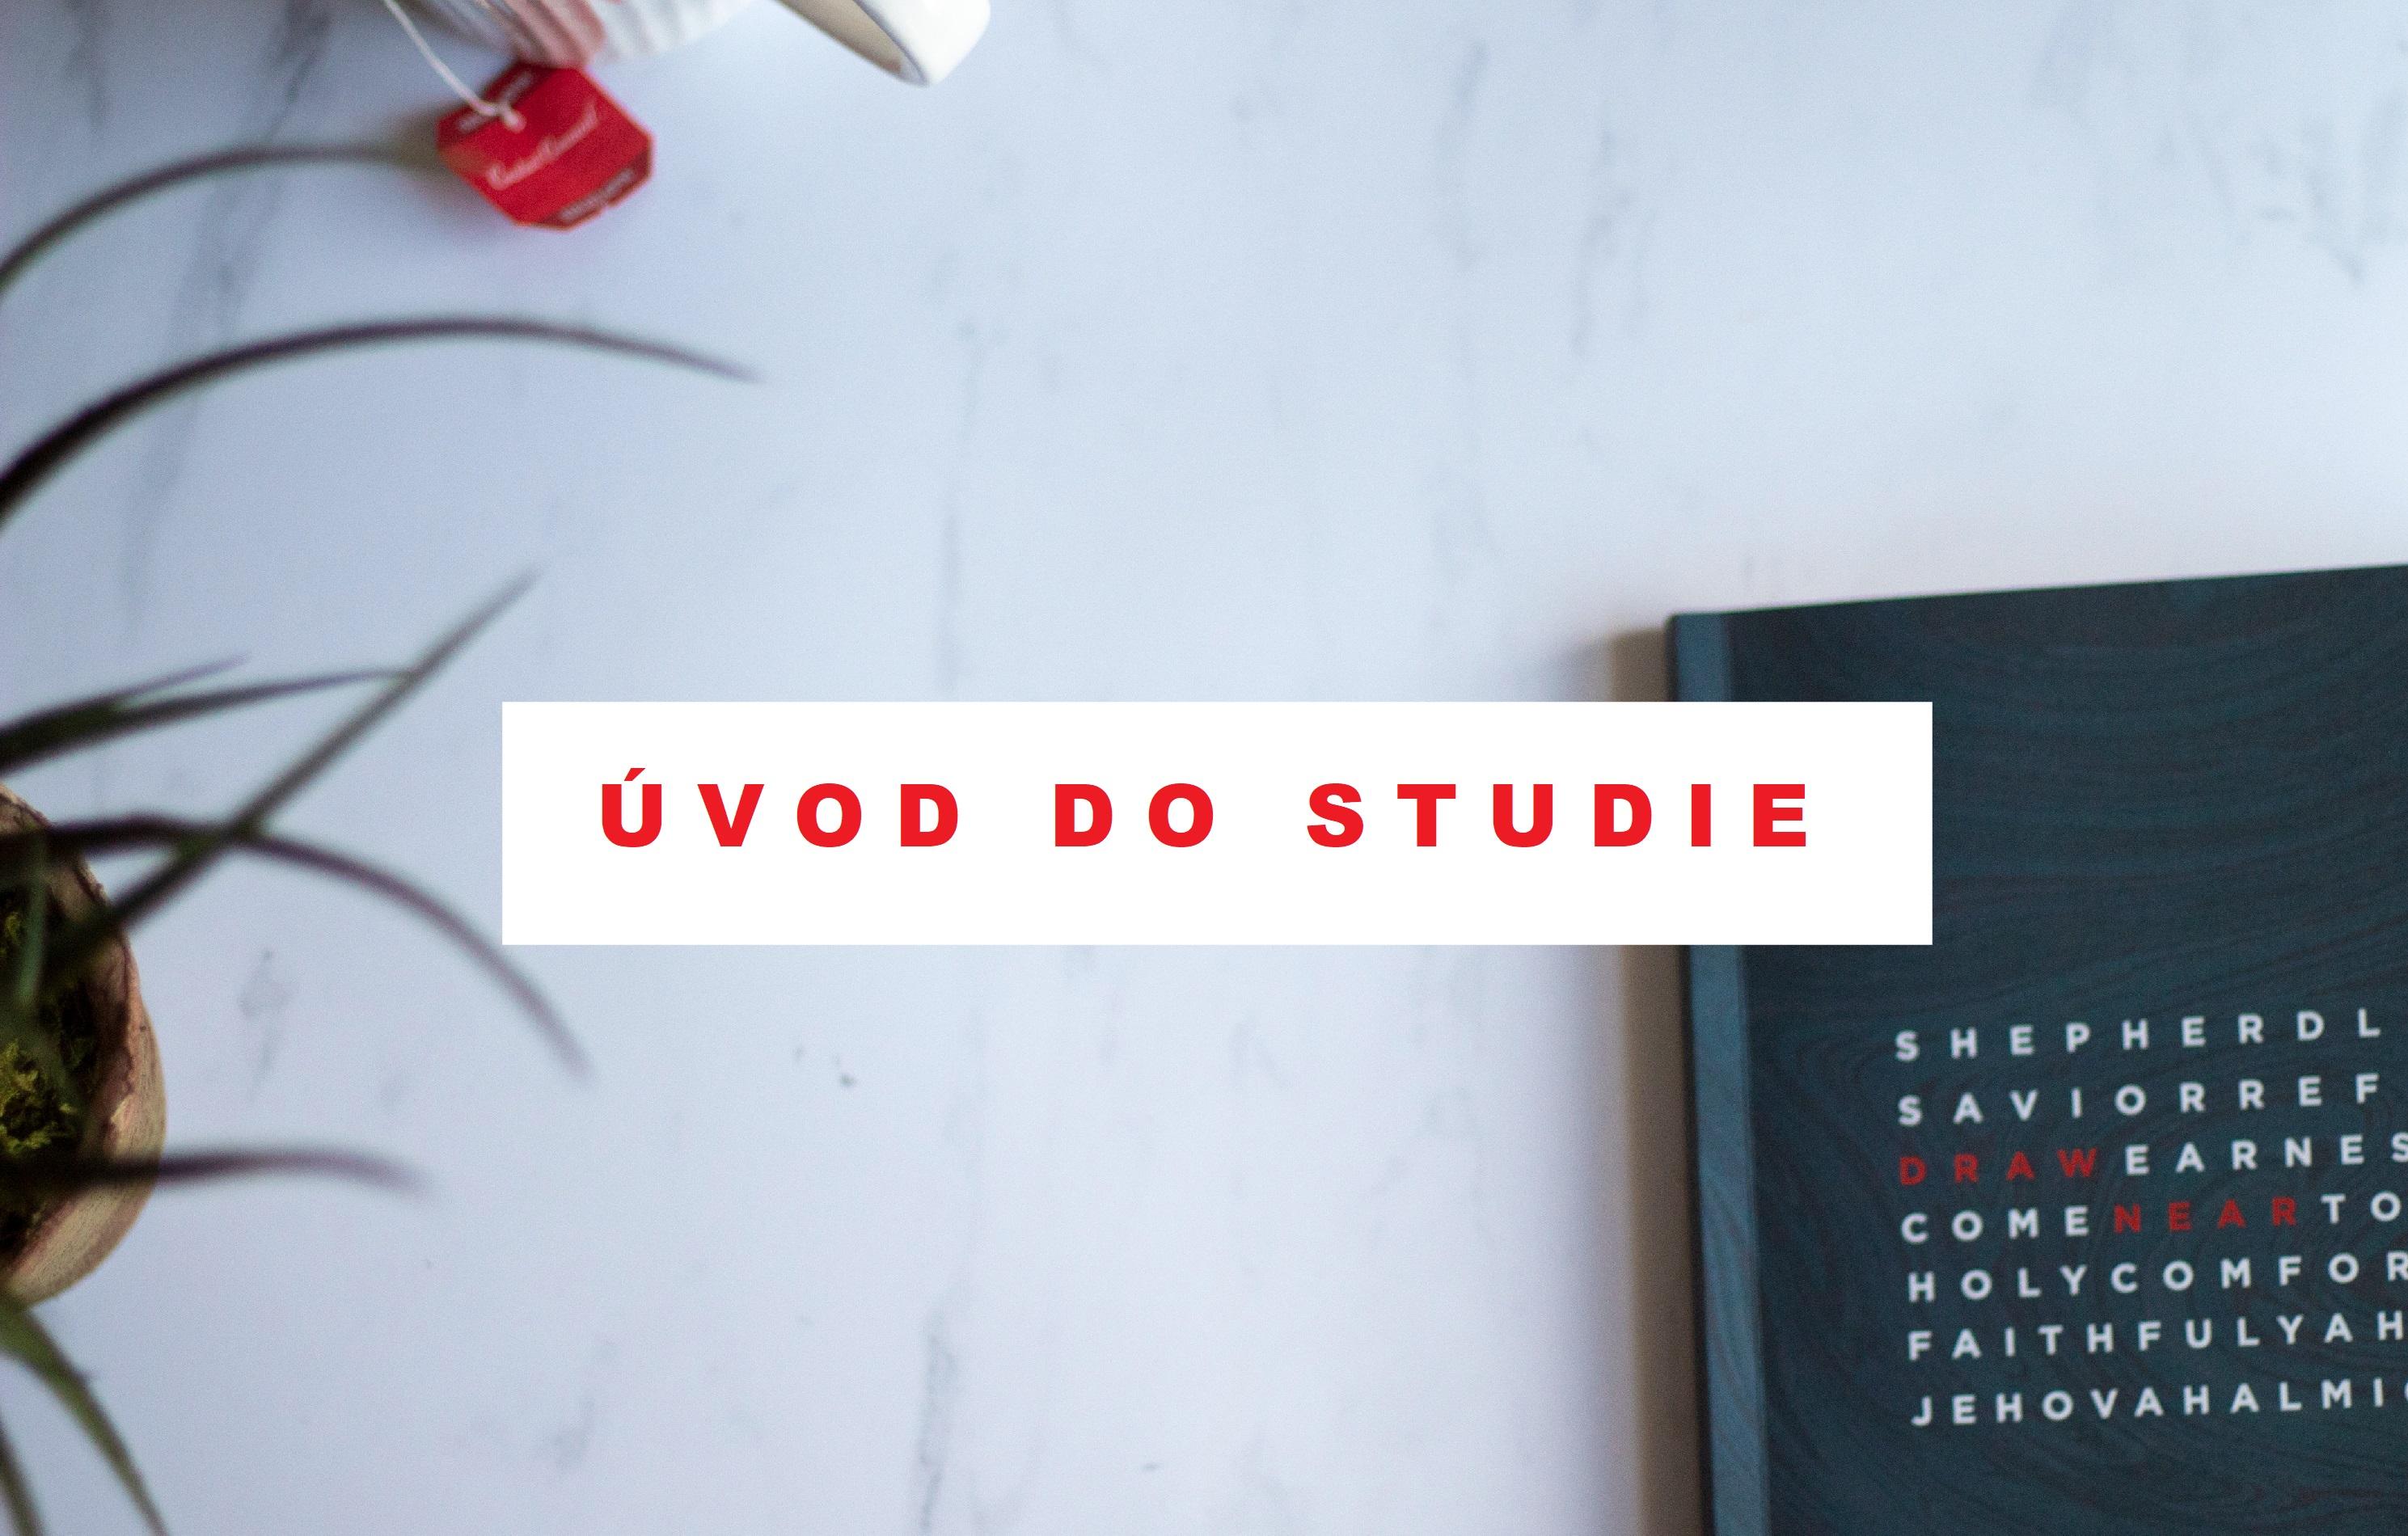 Uvod do studie